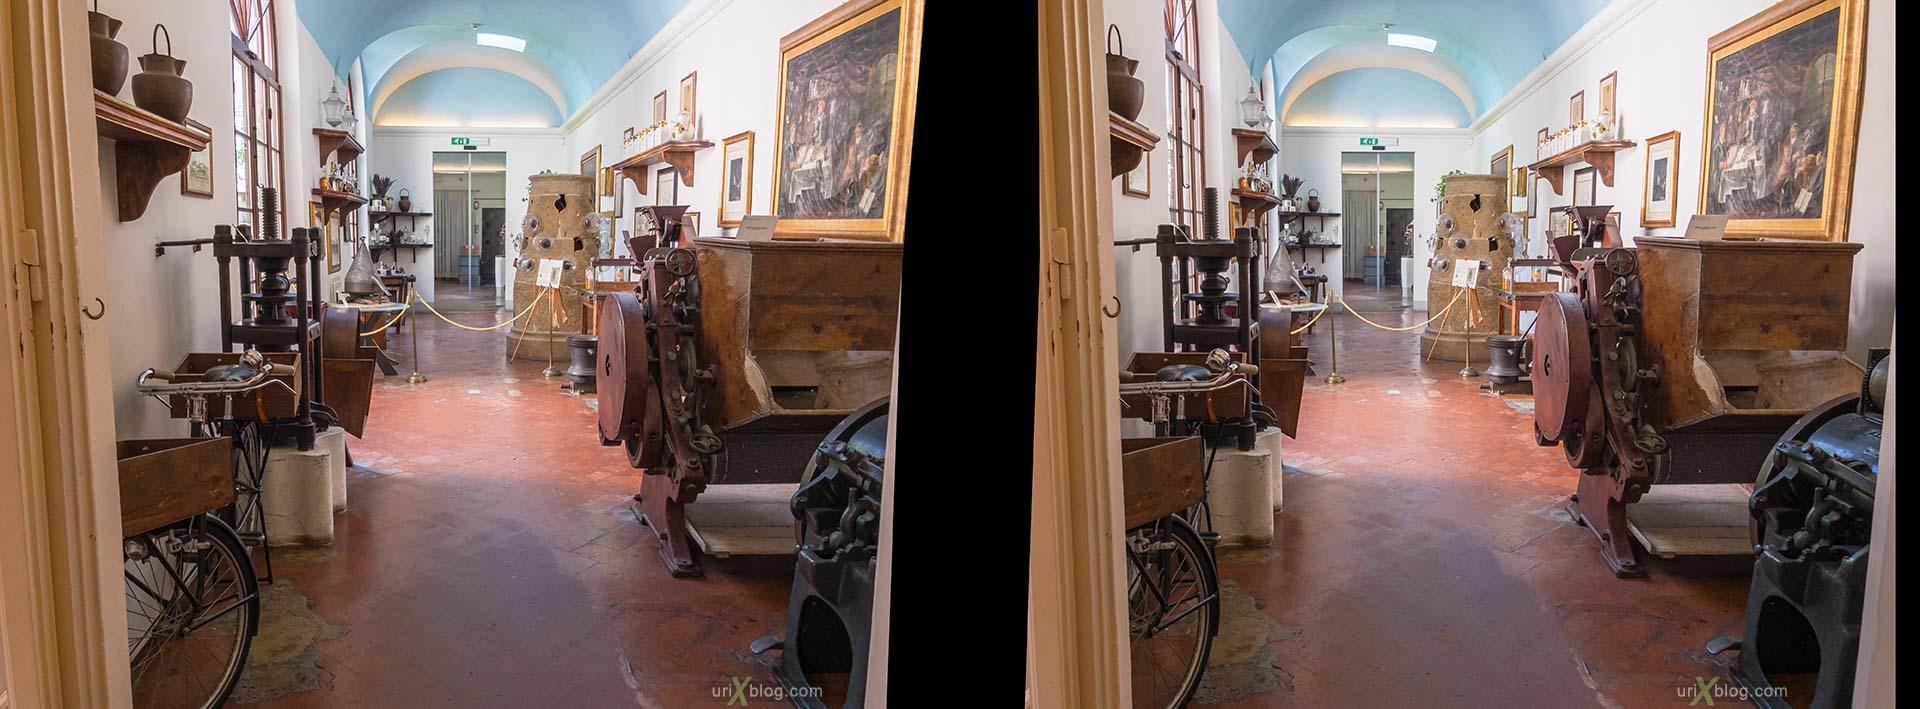 Santa Maria Novella, аптека, Флоренция, Италия, 3D, перекрёстная стереопара, стерео, стереопара